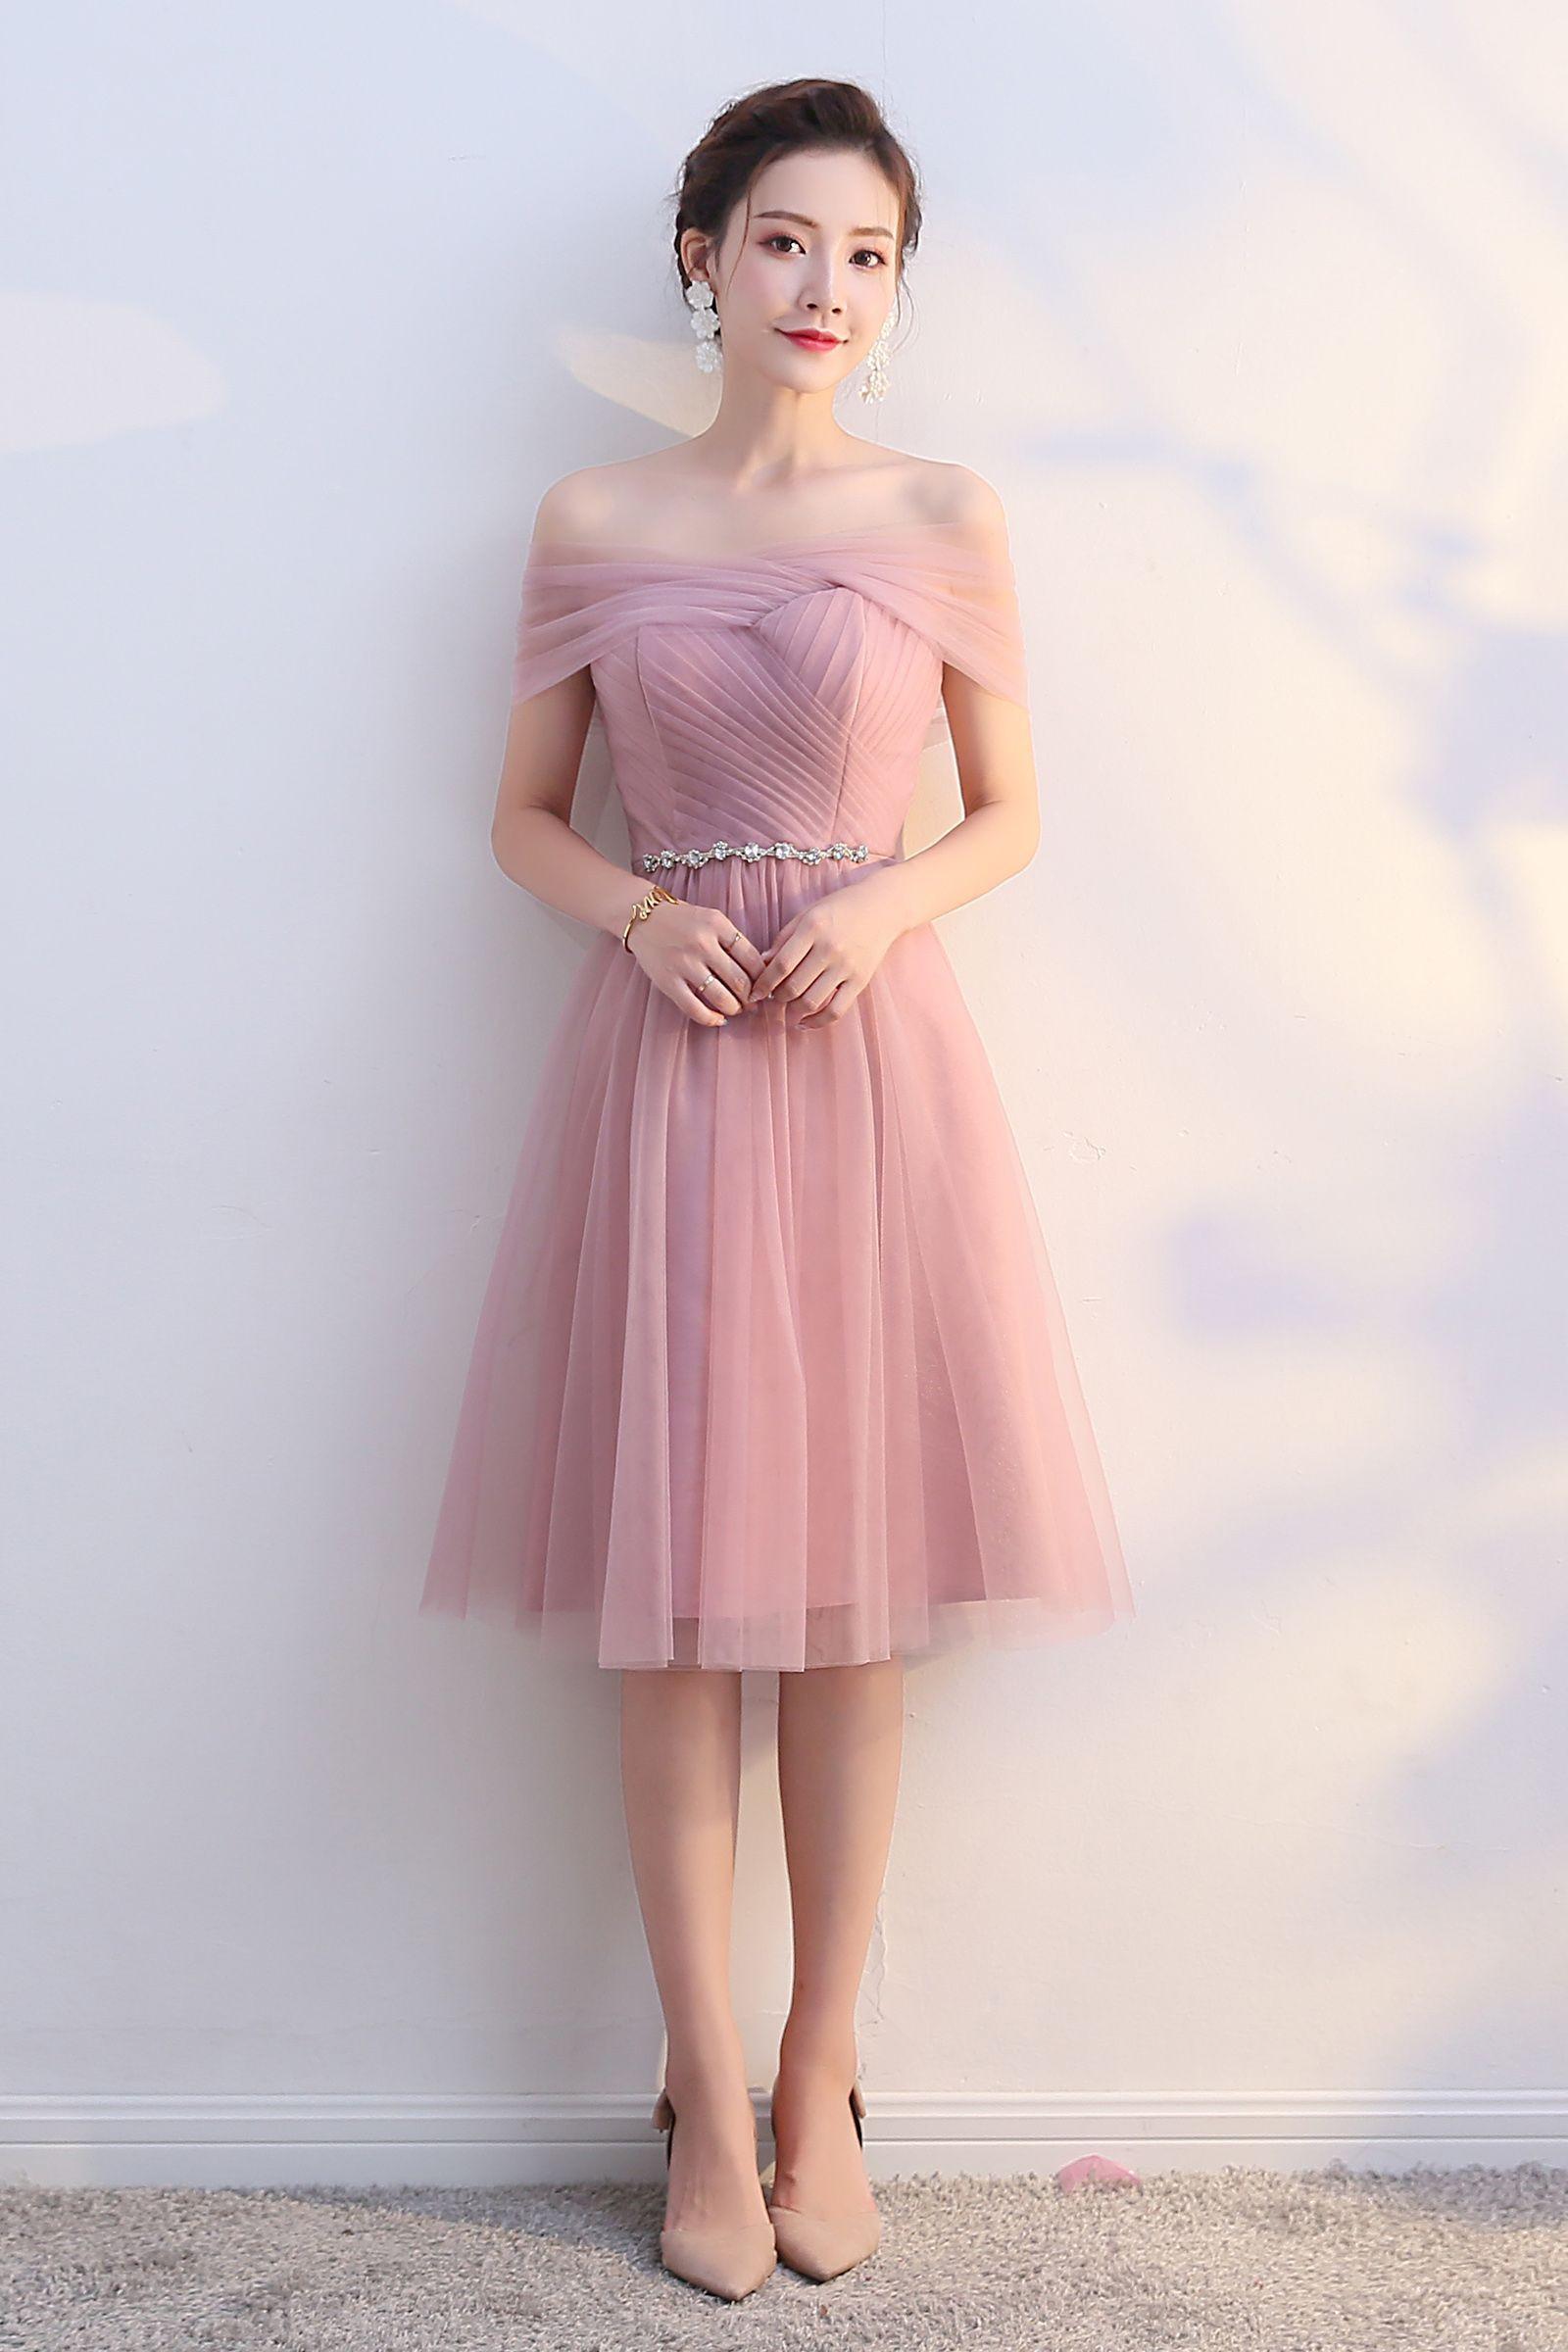 Mini Skirt Evening Dress